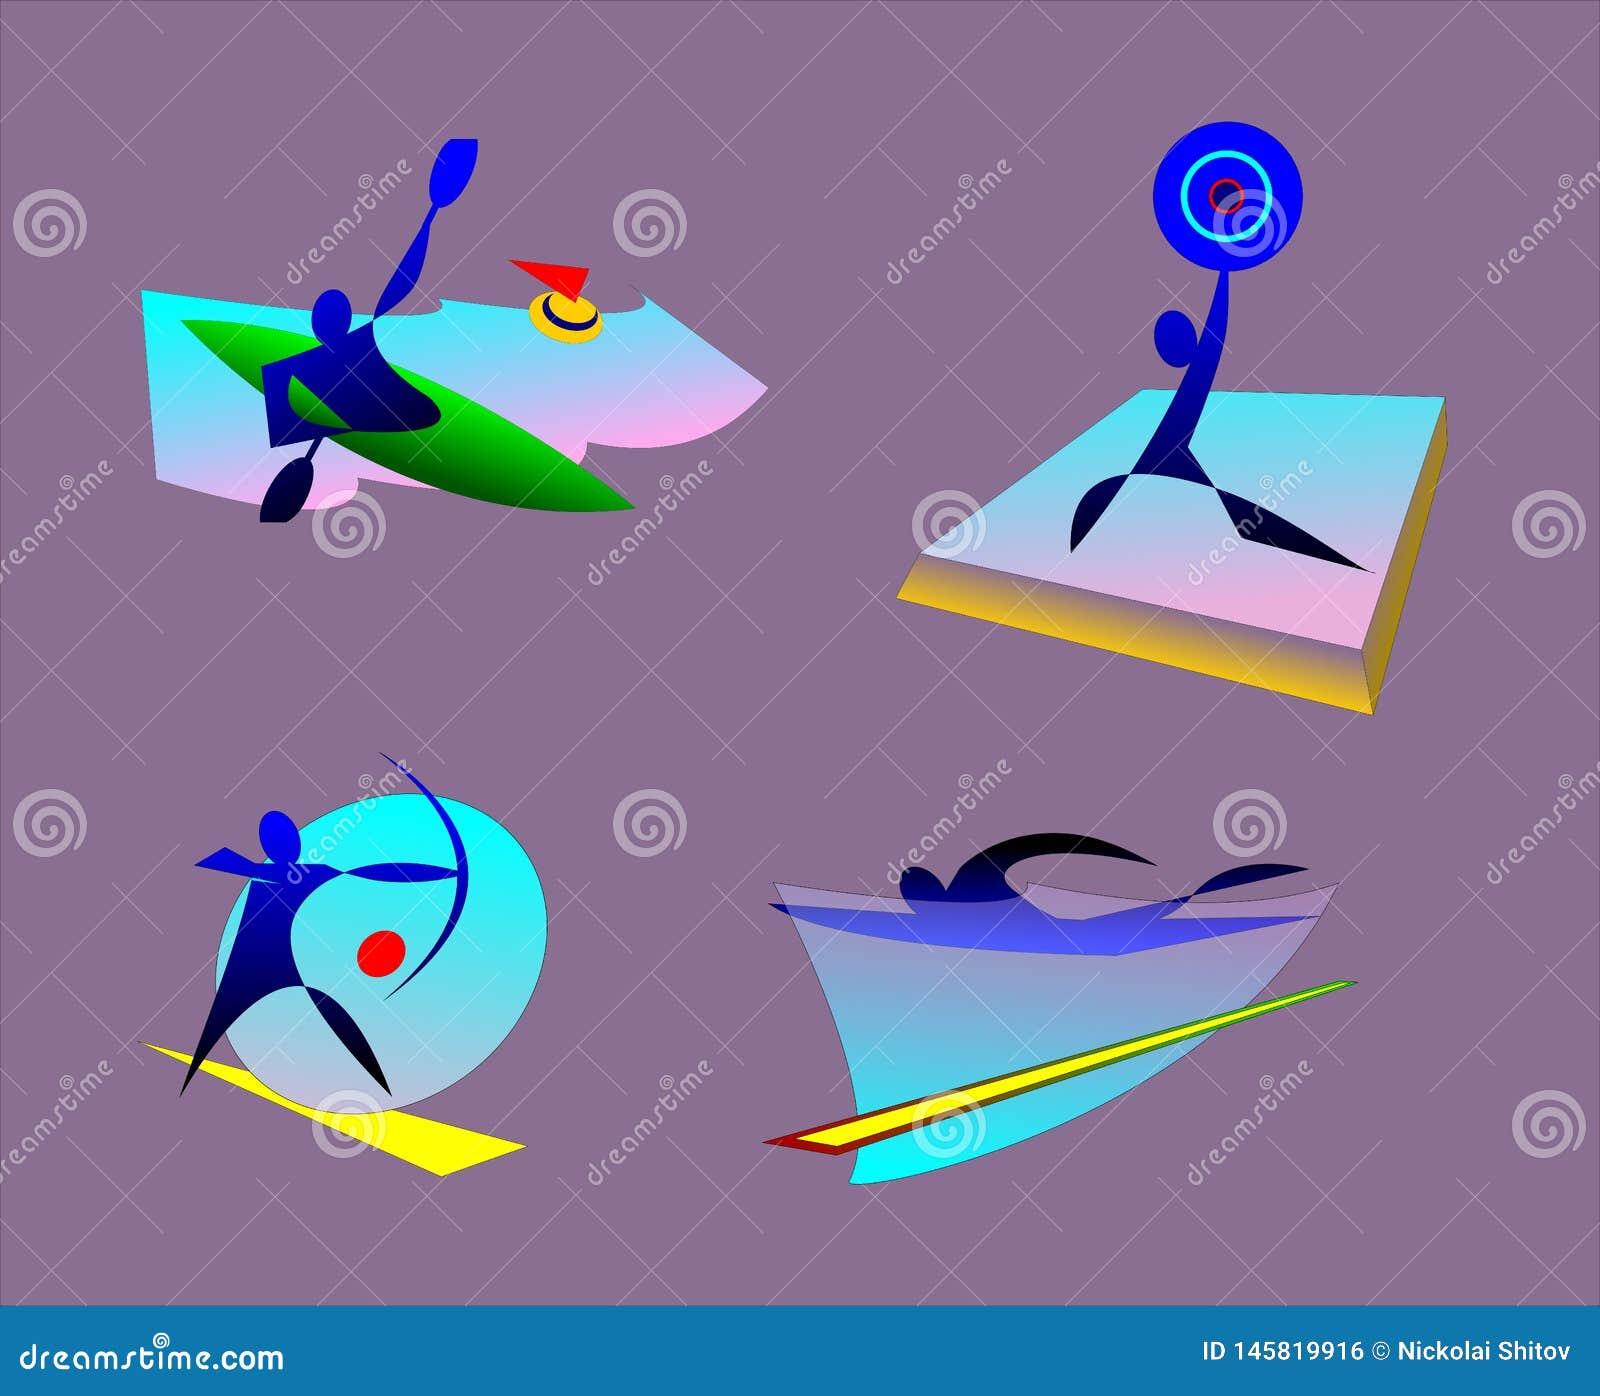 Bages του θερινού ολυμπιακού αθλητισμού , κολύμβηση, τοξοβολία